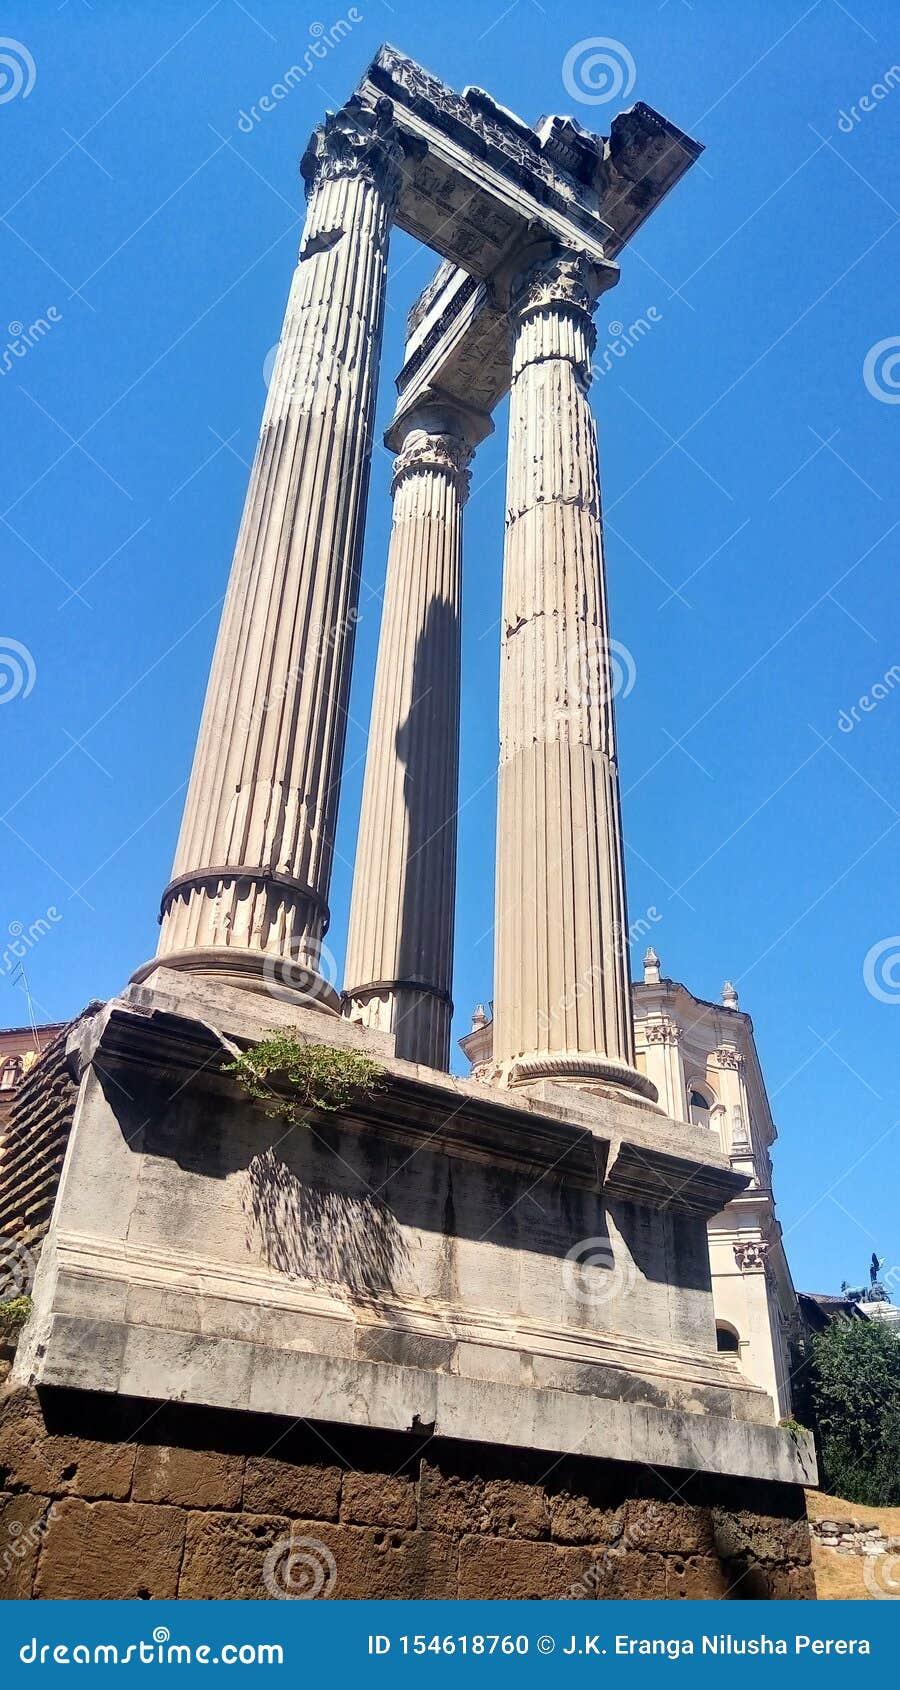 Temple of Appolo Medicus Sosianus